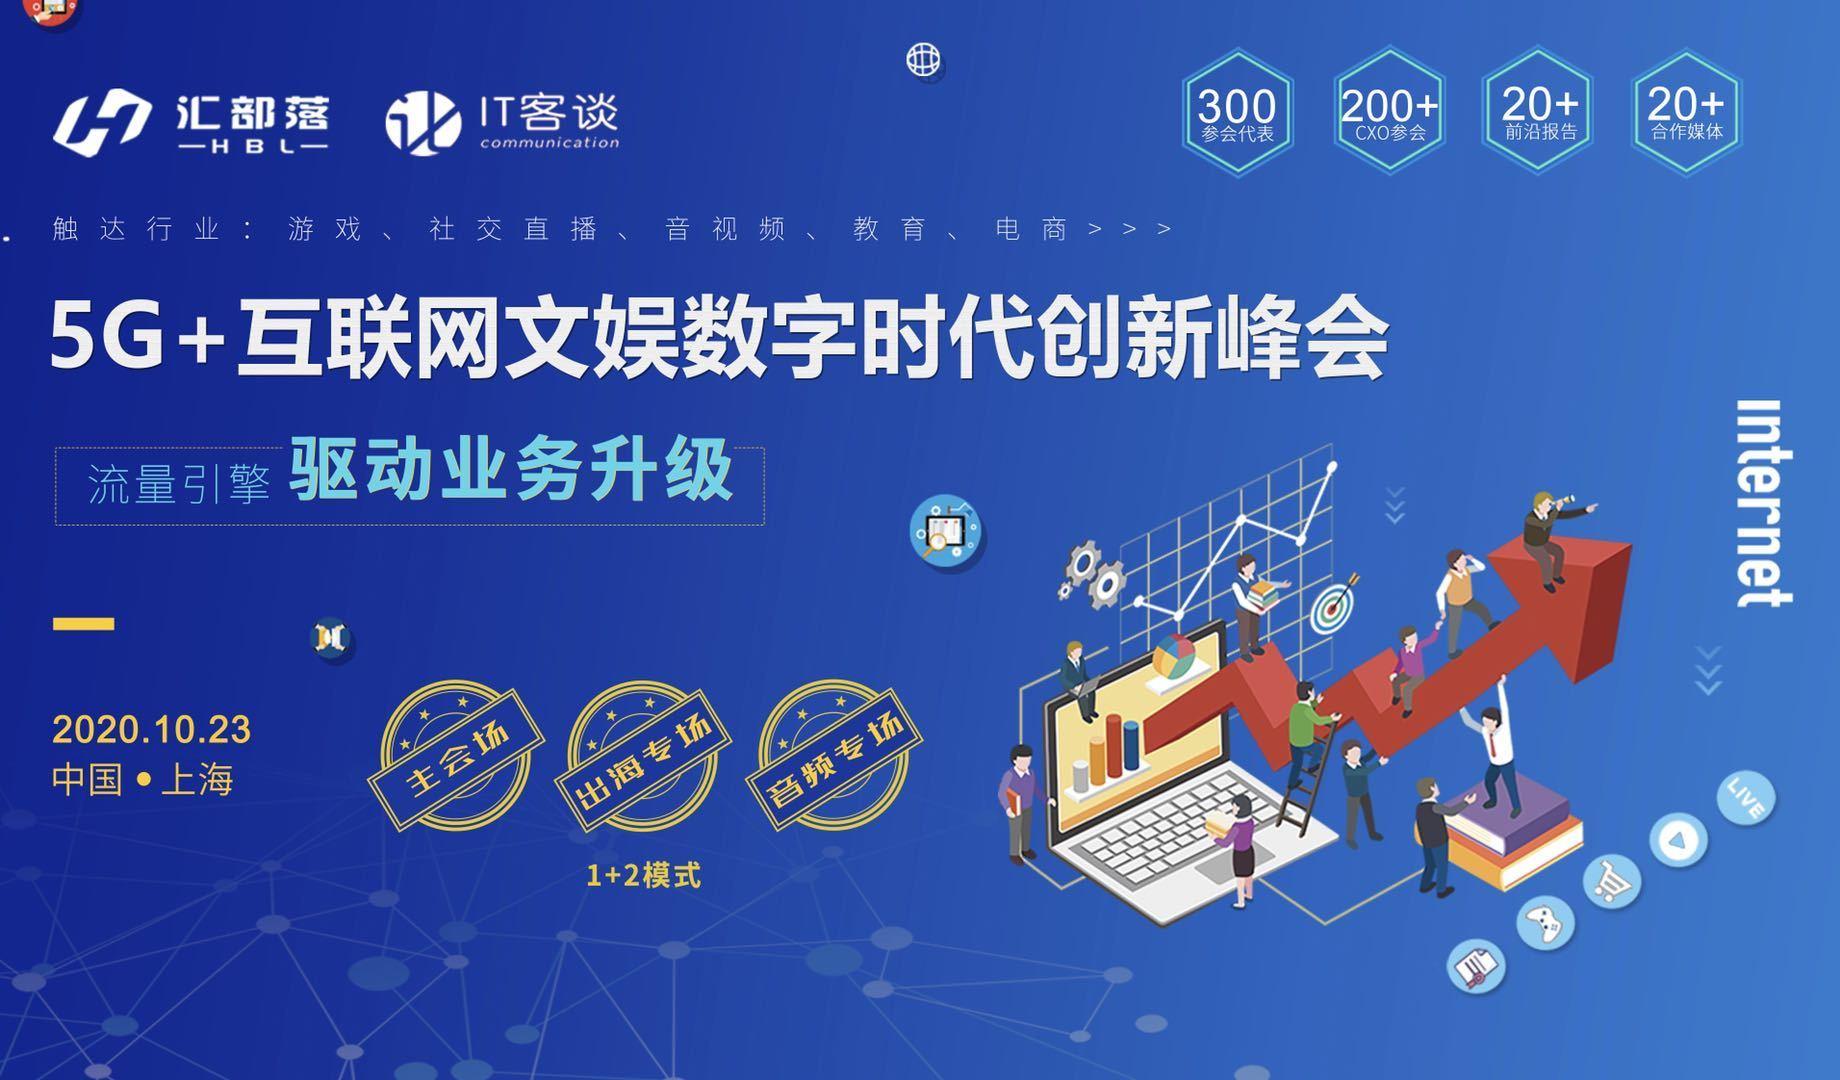 5G+互联网文娱行业数字时代创新峰会